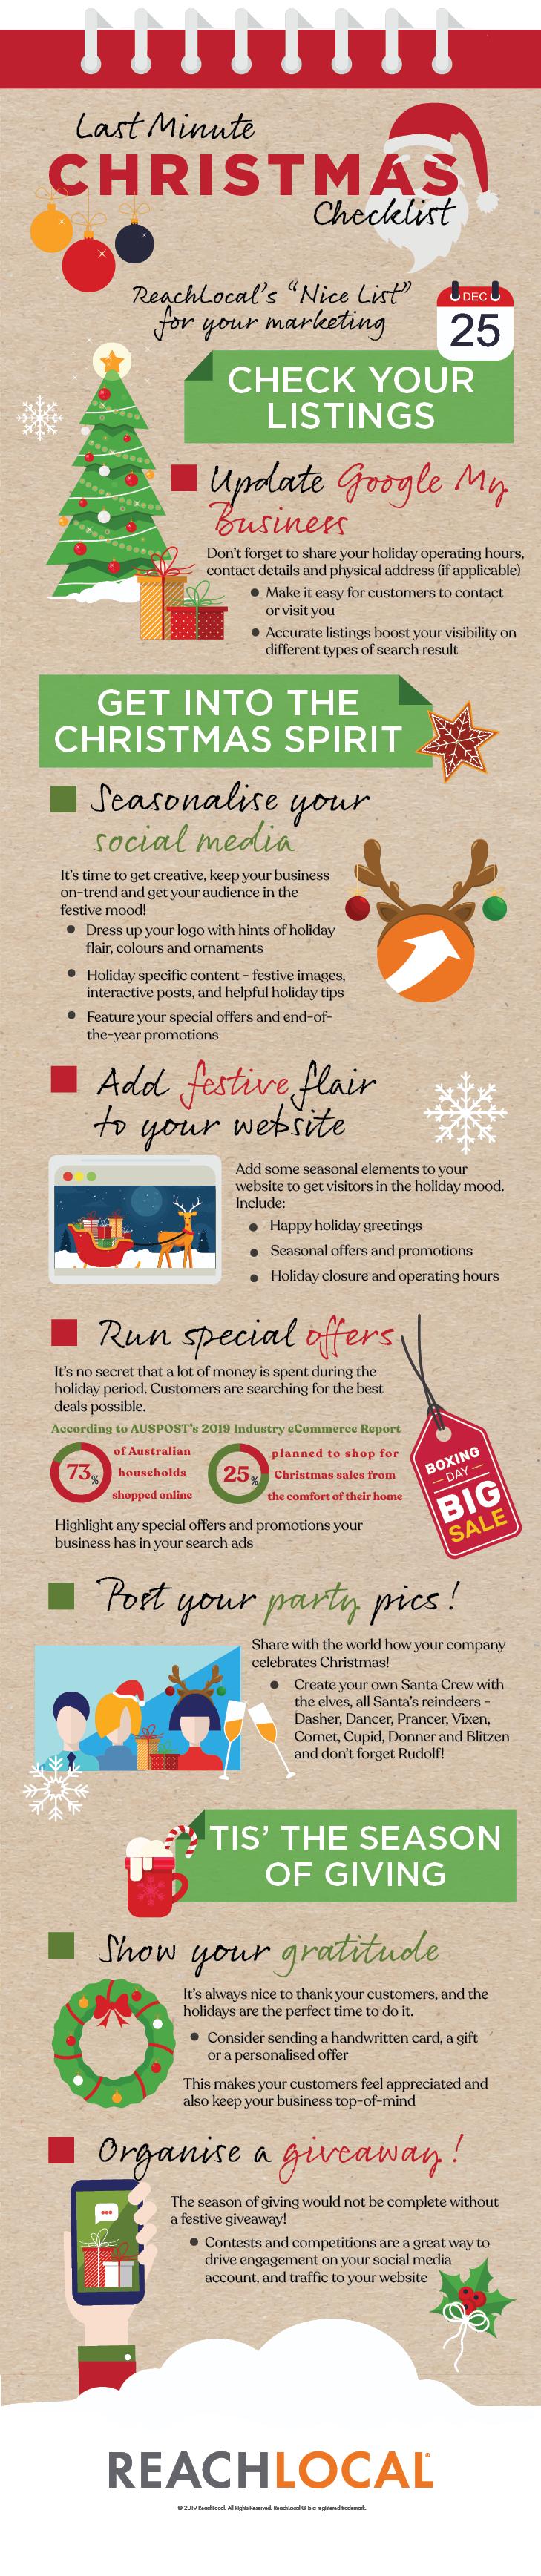 Last Minute Christmas Marketing Checklist